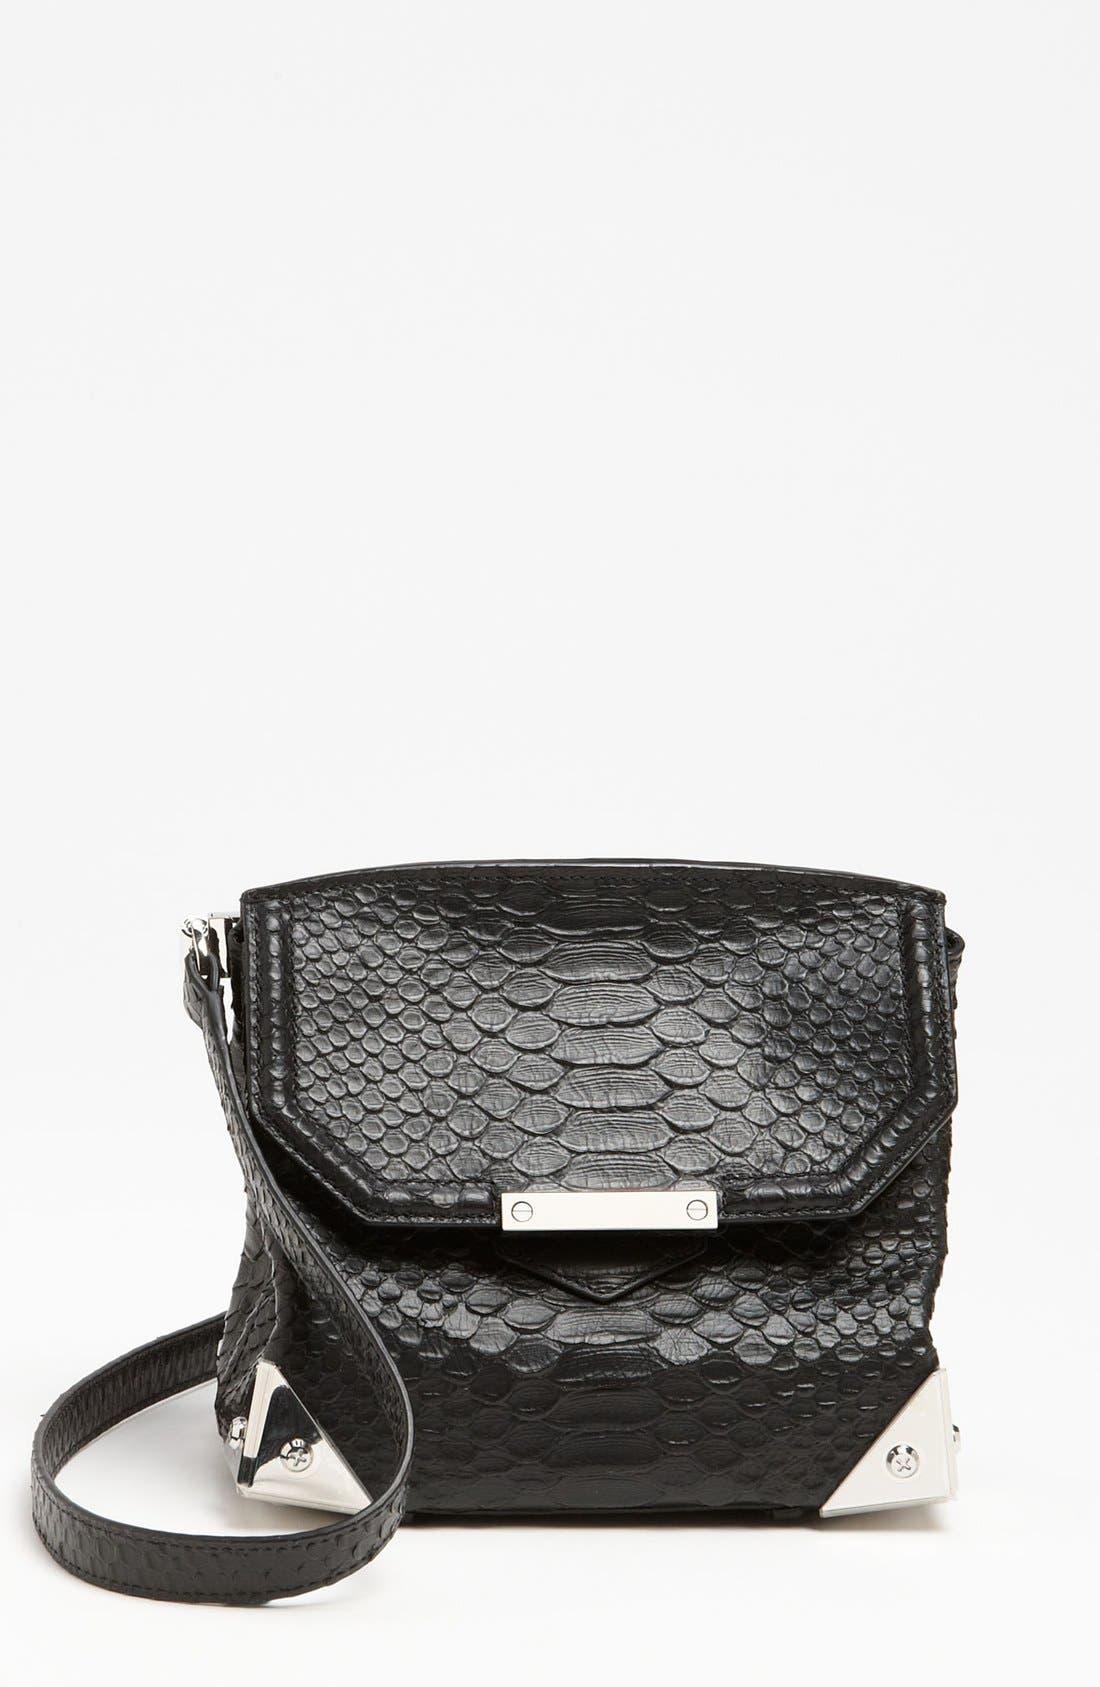 Main Image - Alexander Wang 'Marion - Prisma' Python Embossed Leather Crossbody Bag